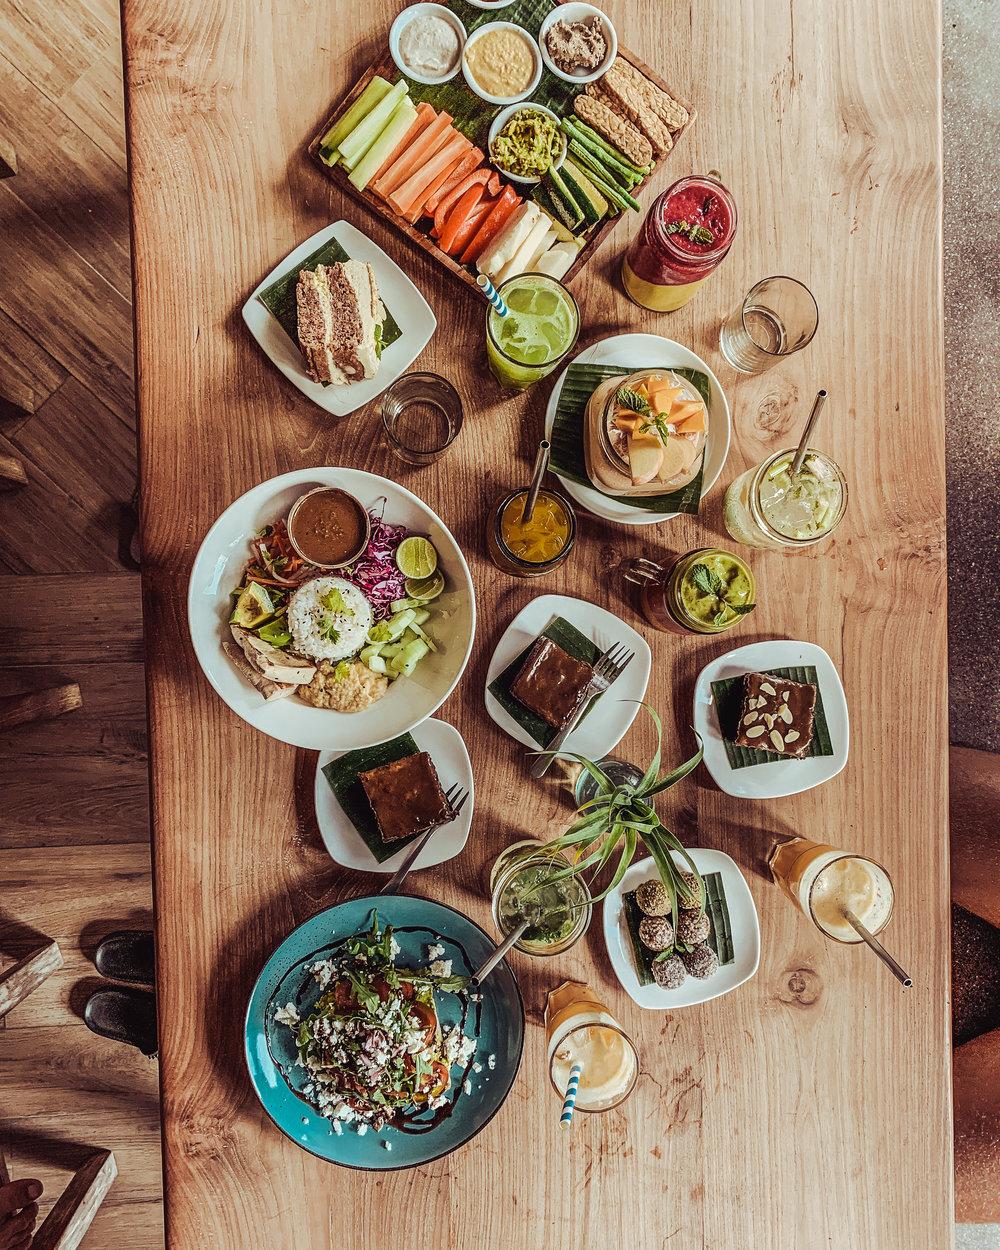 gili-island-food (1 of 1).jpg